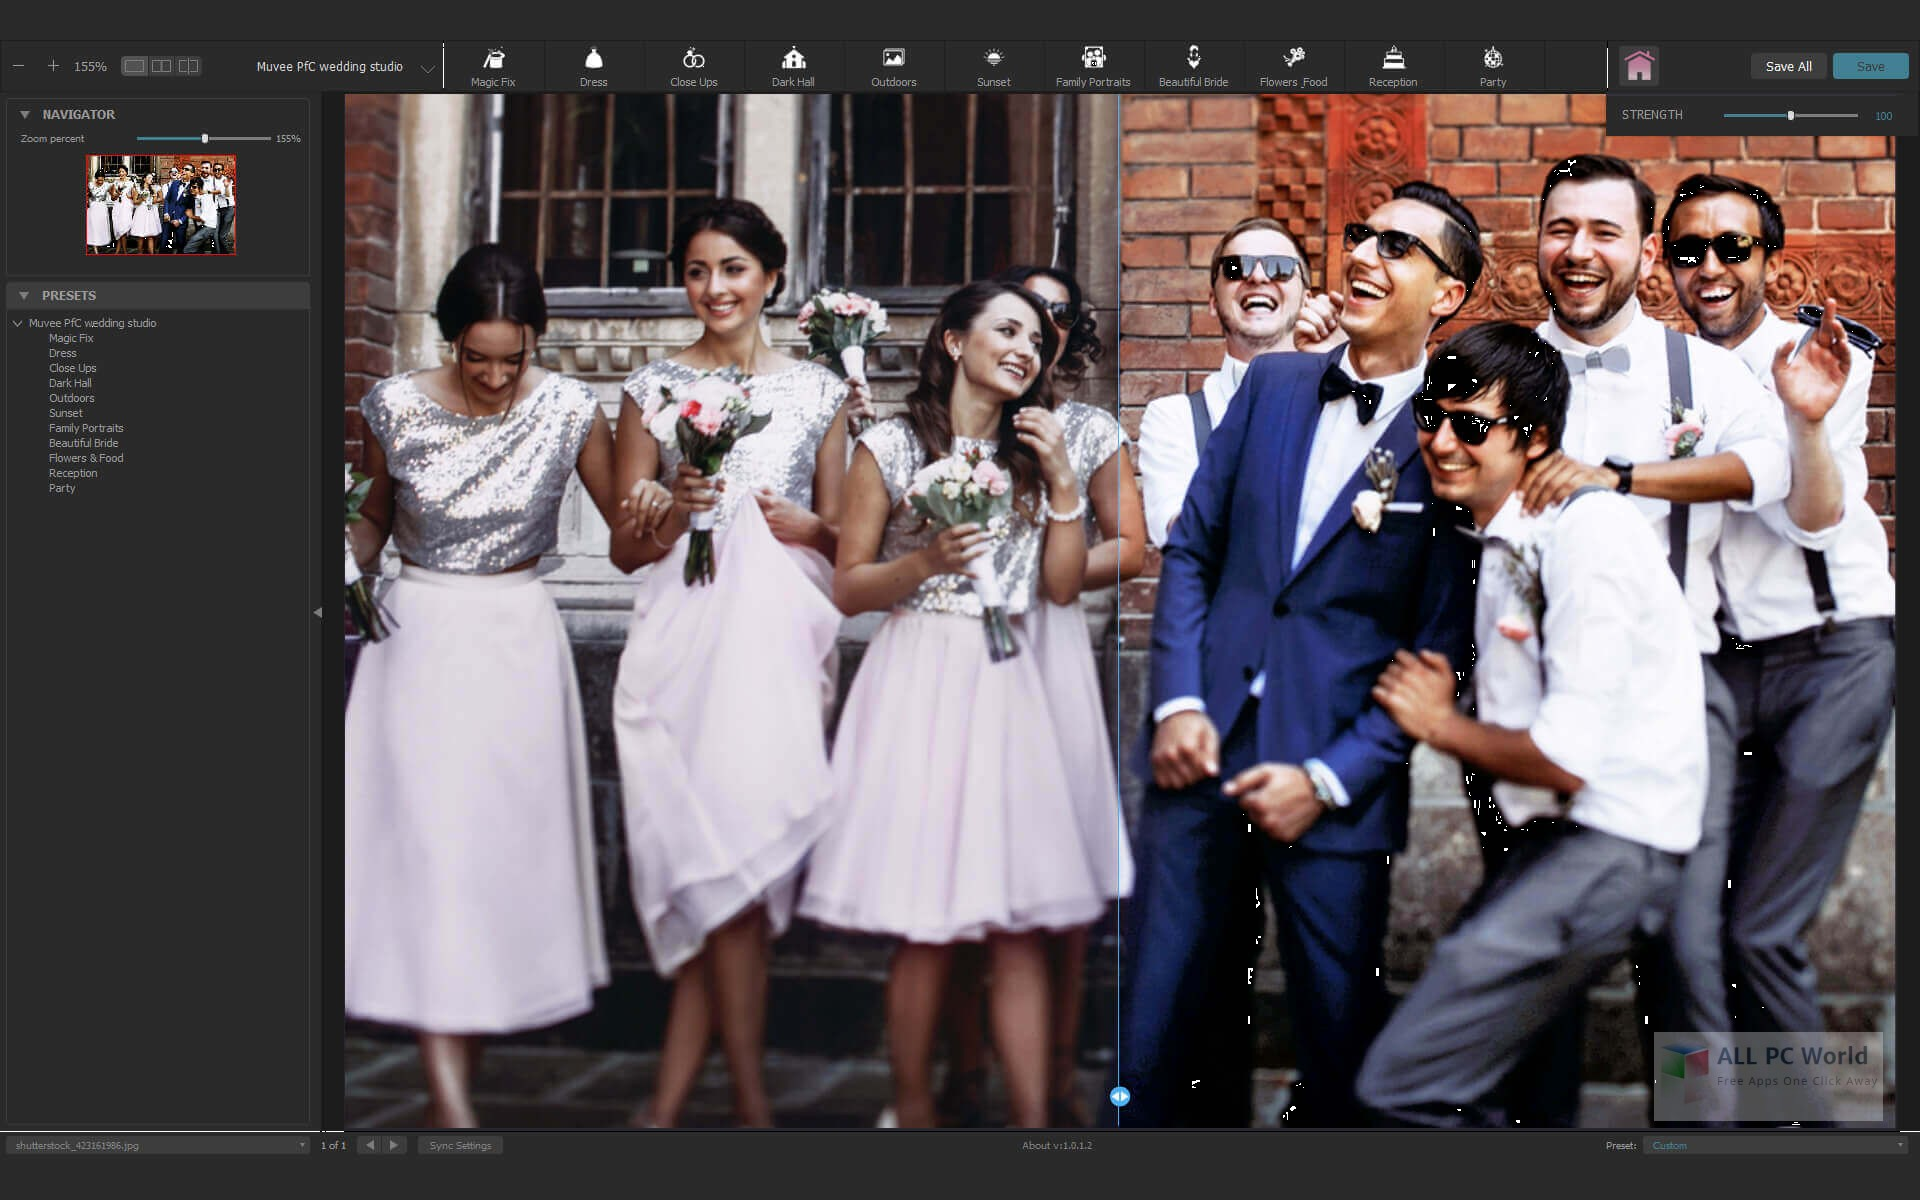 muvee Wedding Studio 12.0 Free Download